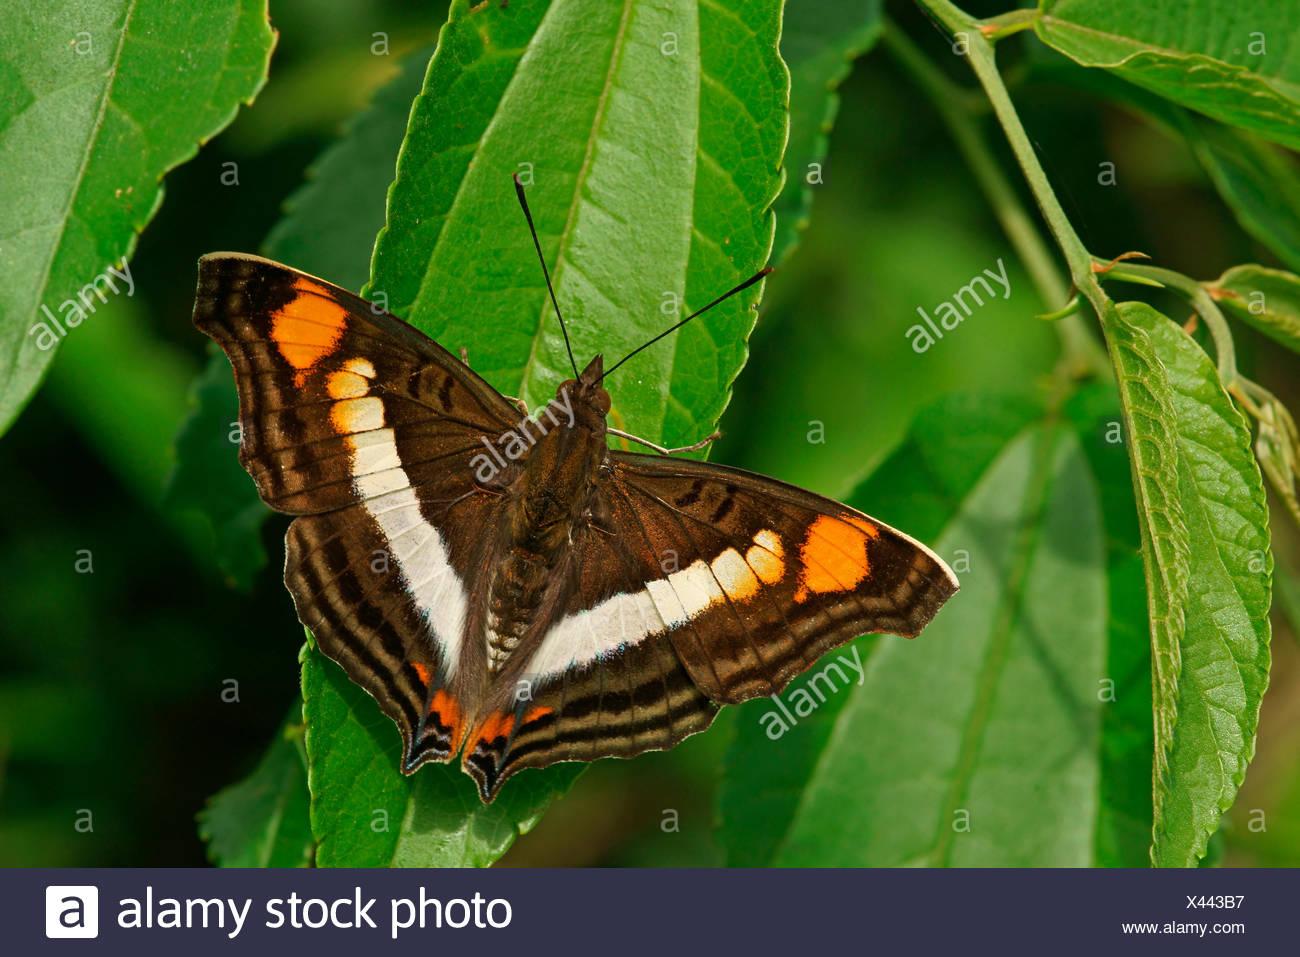 Nymphalidae (Nymphidae) Tropical butterfly (Doxocopa linda), Iguazú National Park, Paraná, Brazil - Stock Image